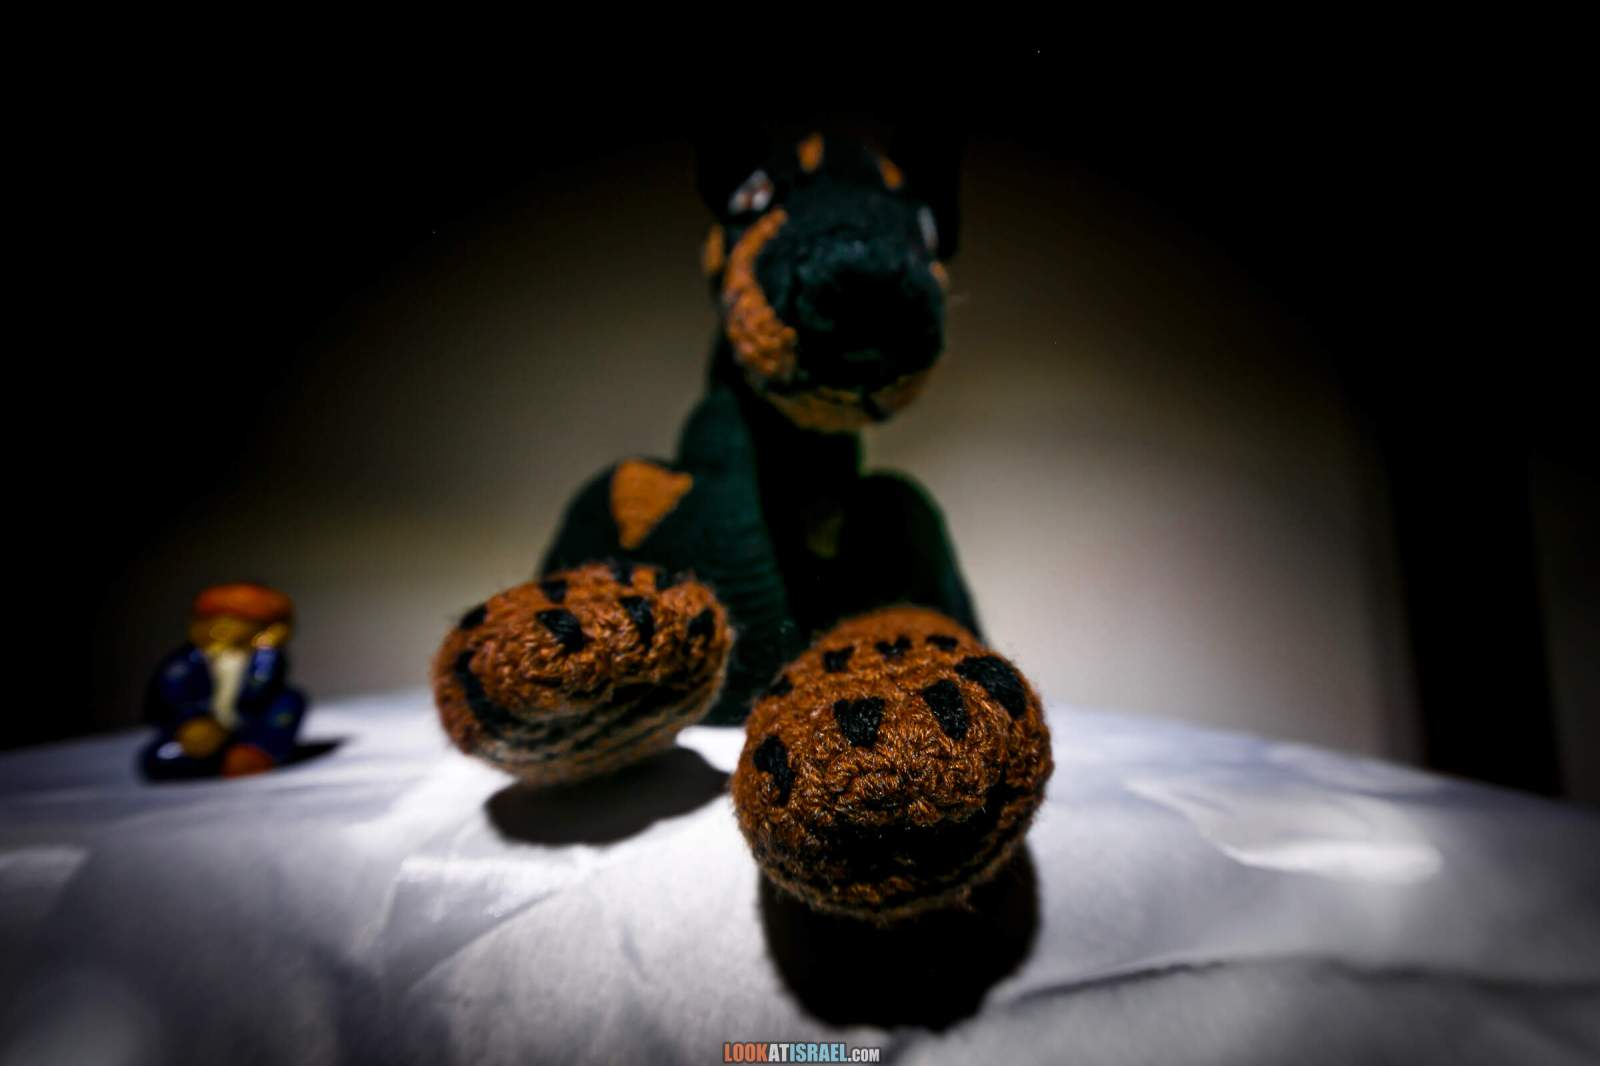 Вязанная игрушка доберман Кибрай | Knitted toy doberman | LookAtIsrael.com - Фото путешествия по Израилю